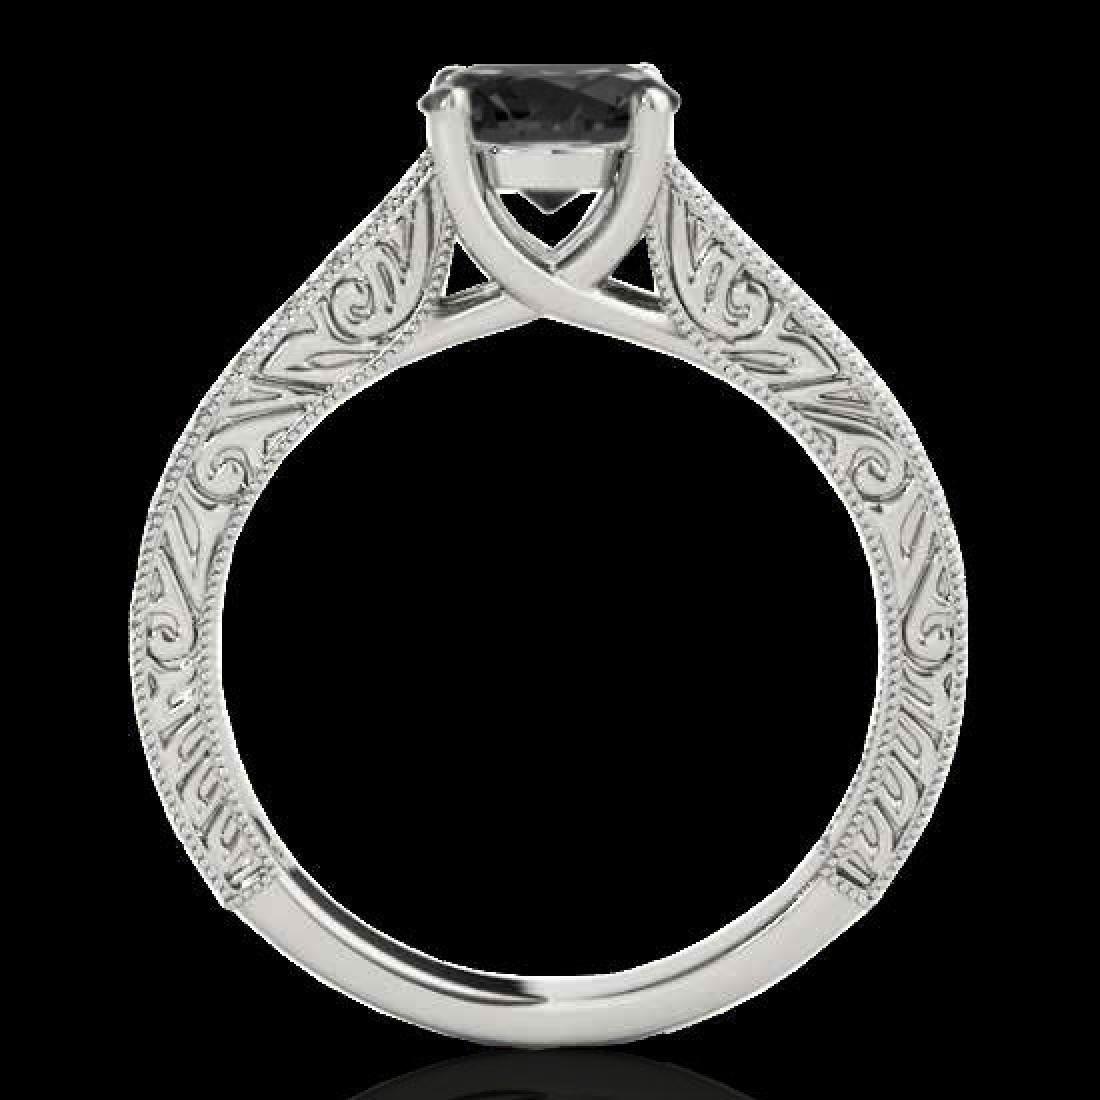 1.32 CTW Certified VS Black Diamond Solitaire Ring 10K